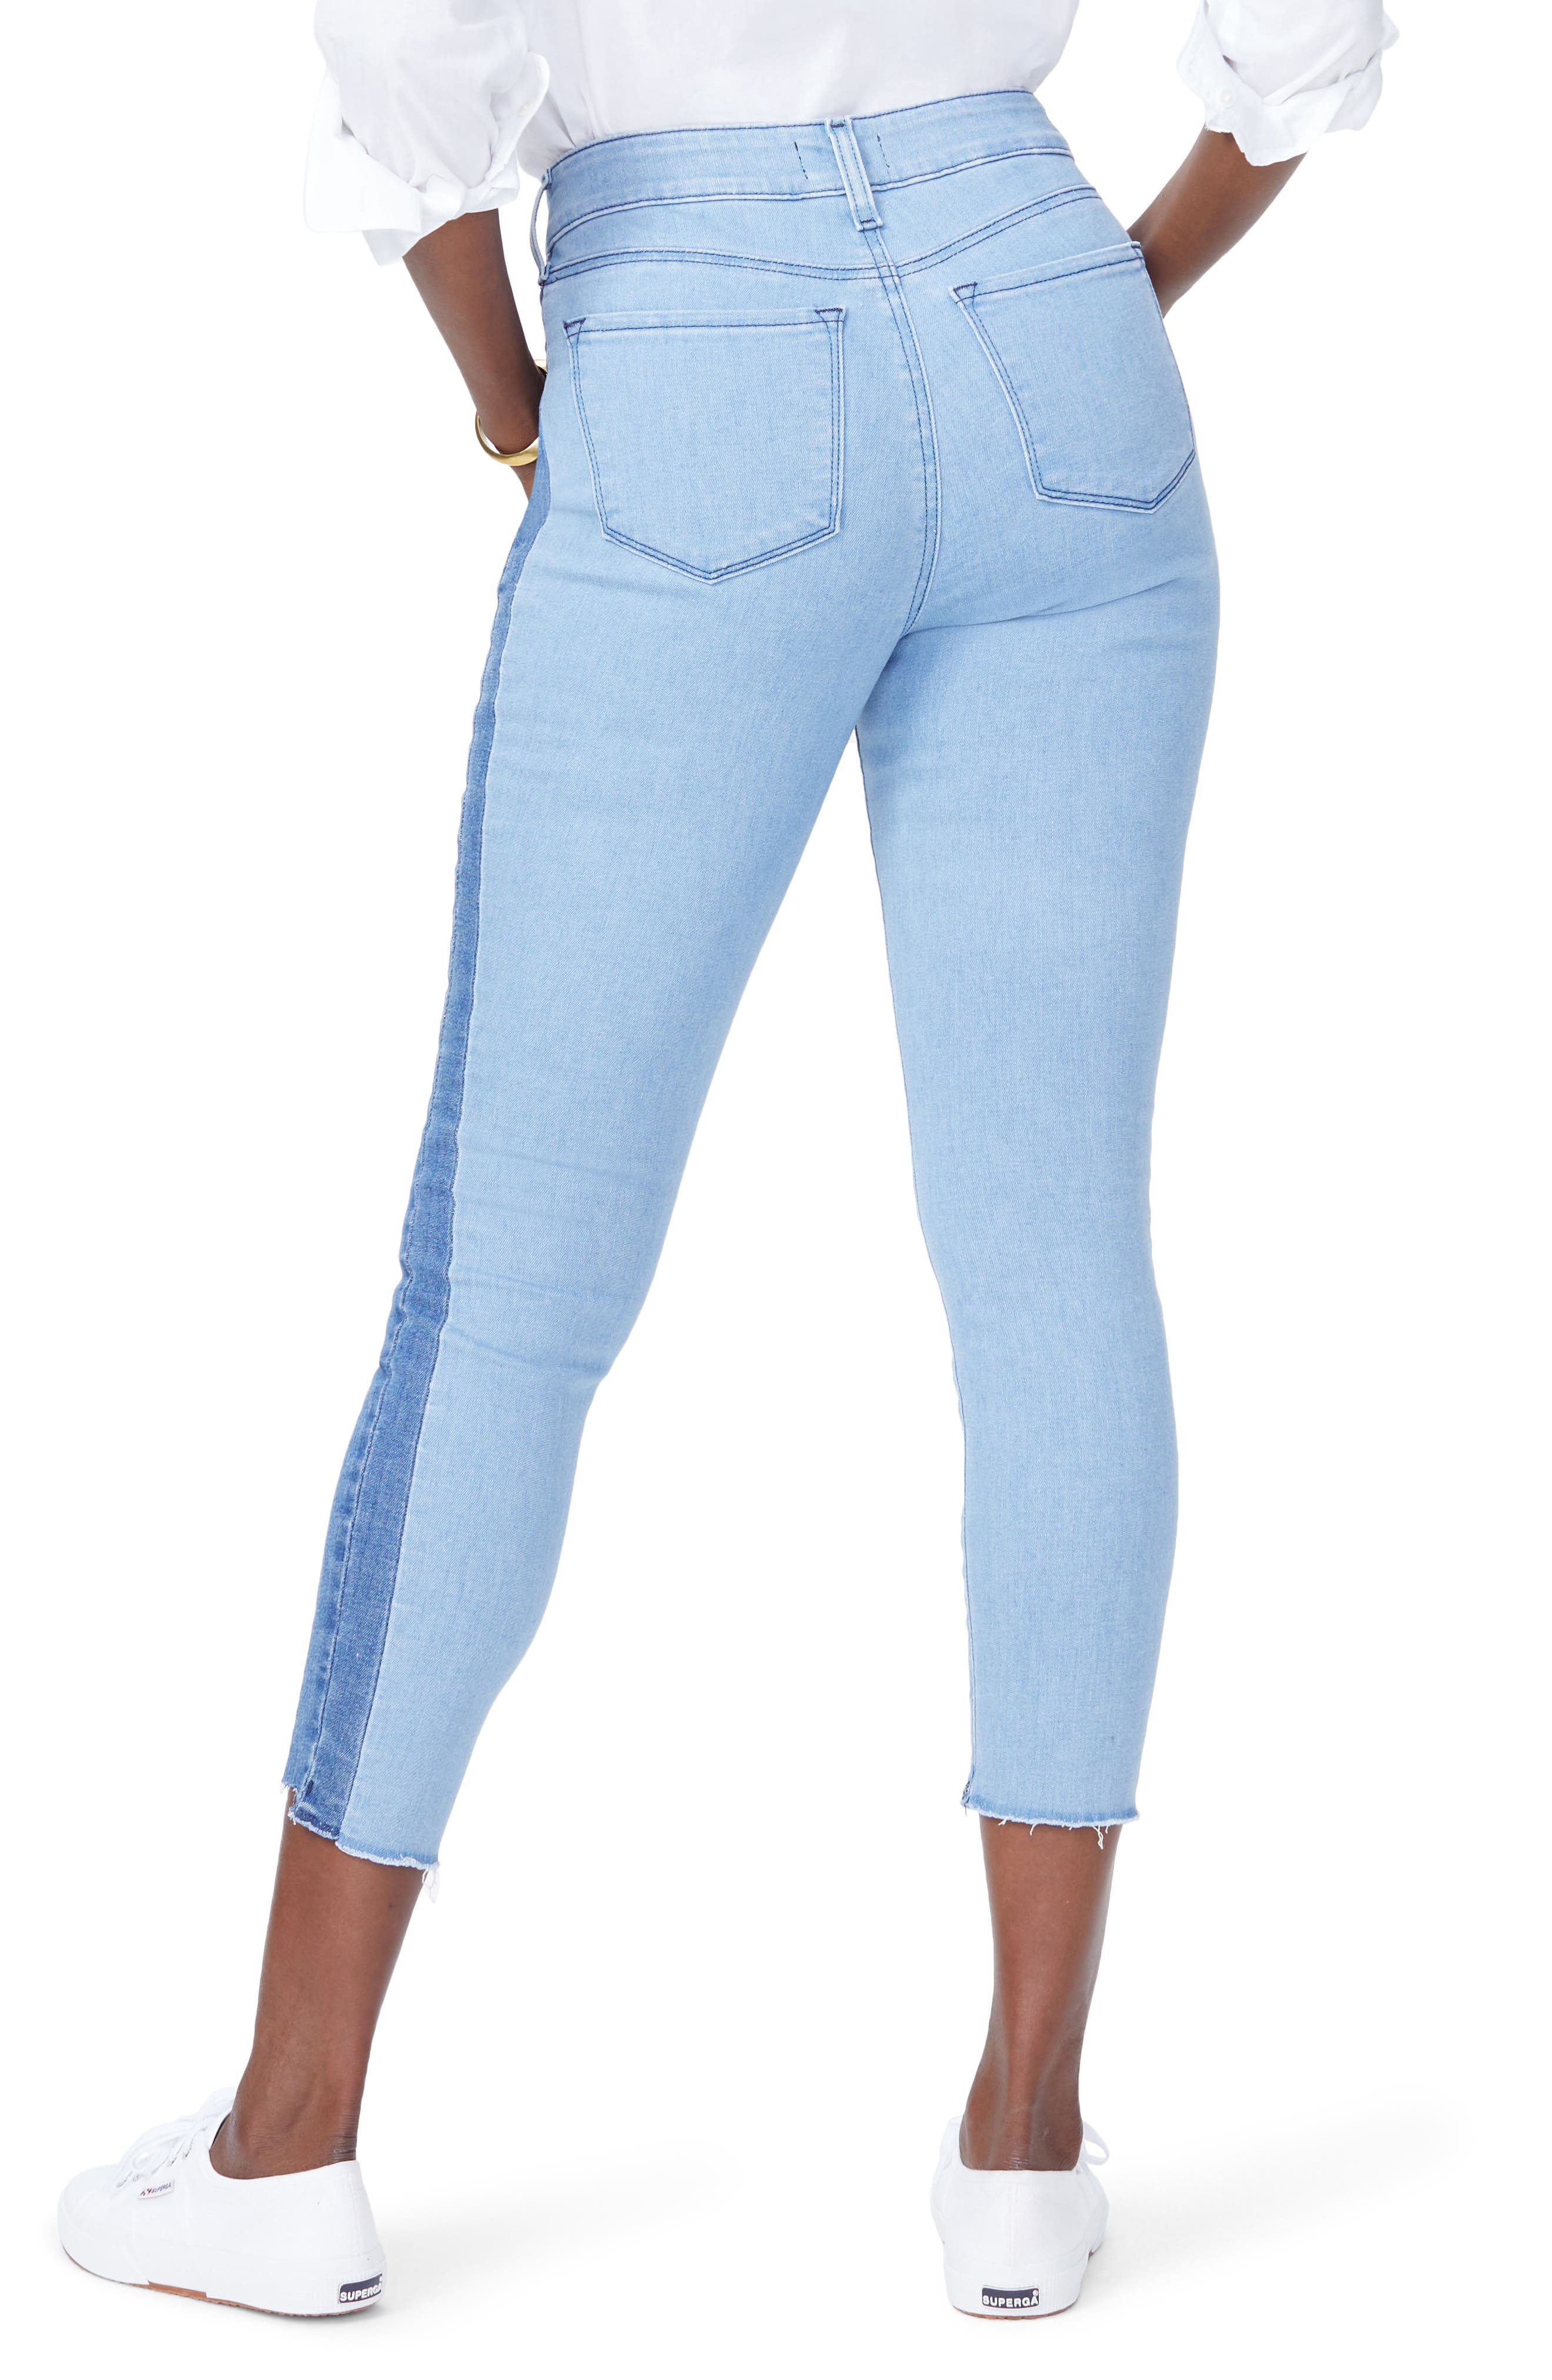 Ami Stretch Ankle Skinny Contrast Step Hem Jeans,                             Alternate thumbnail 2, color,                             462